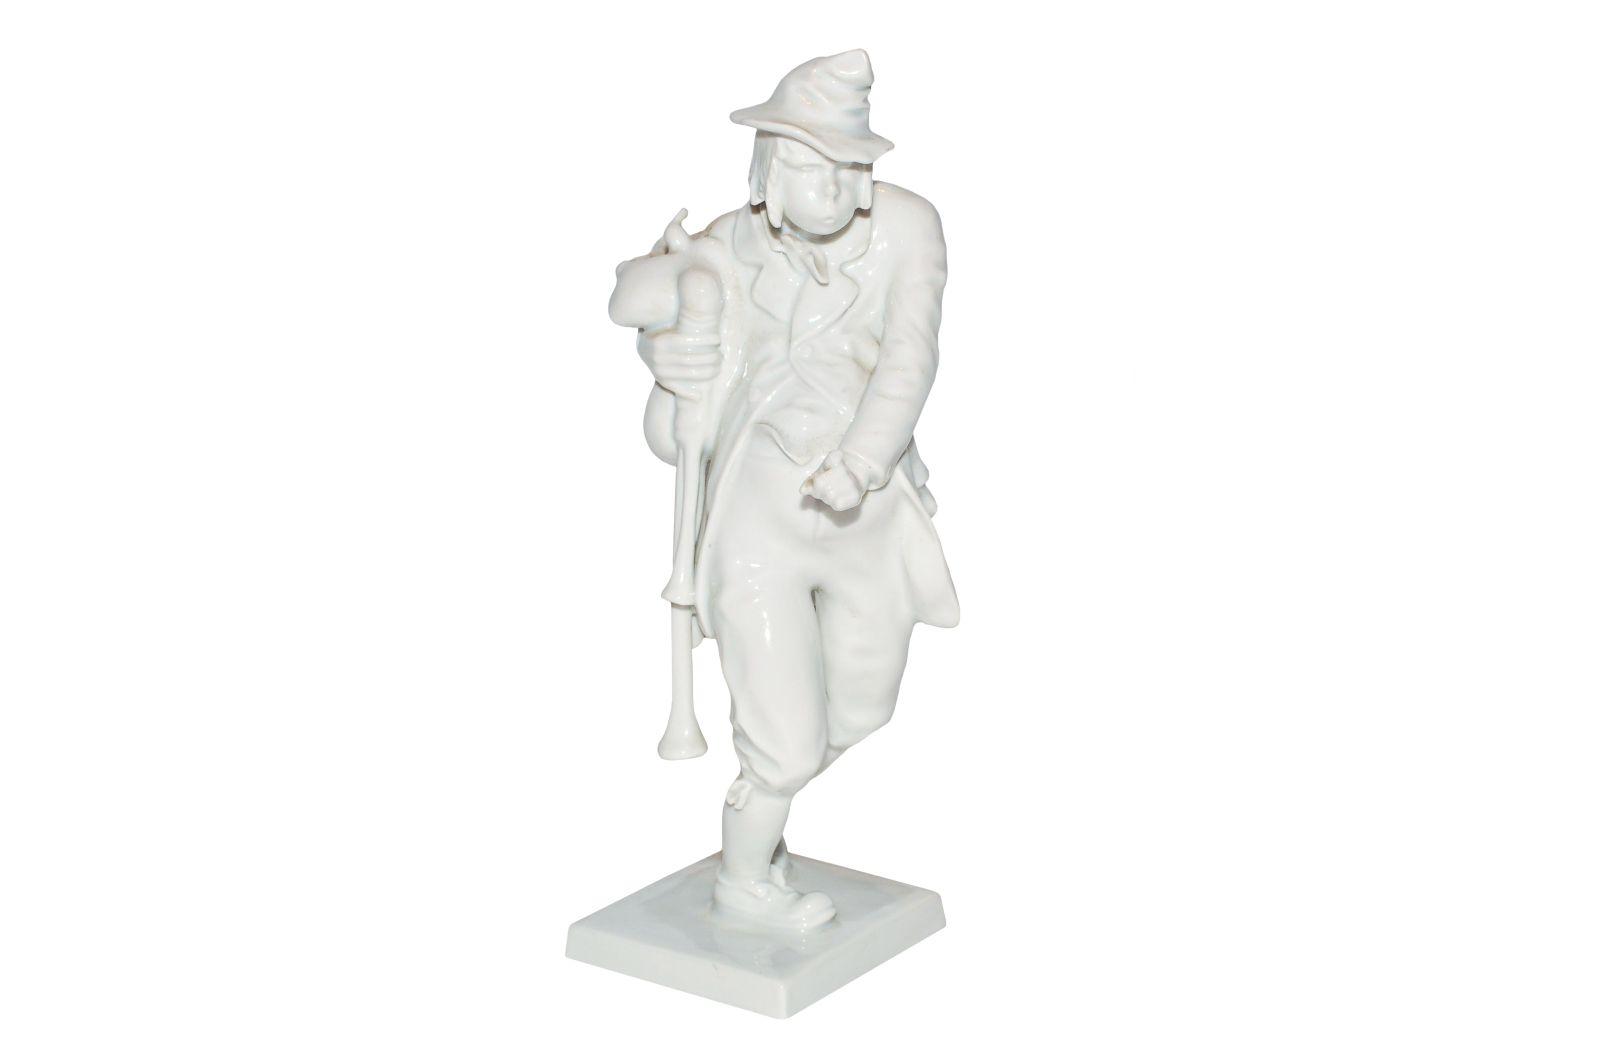 #204 Figurine Image